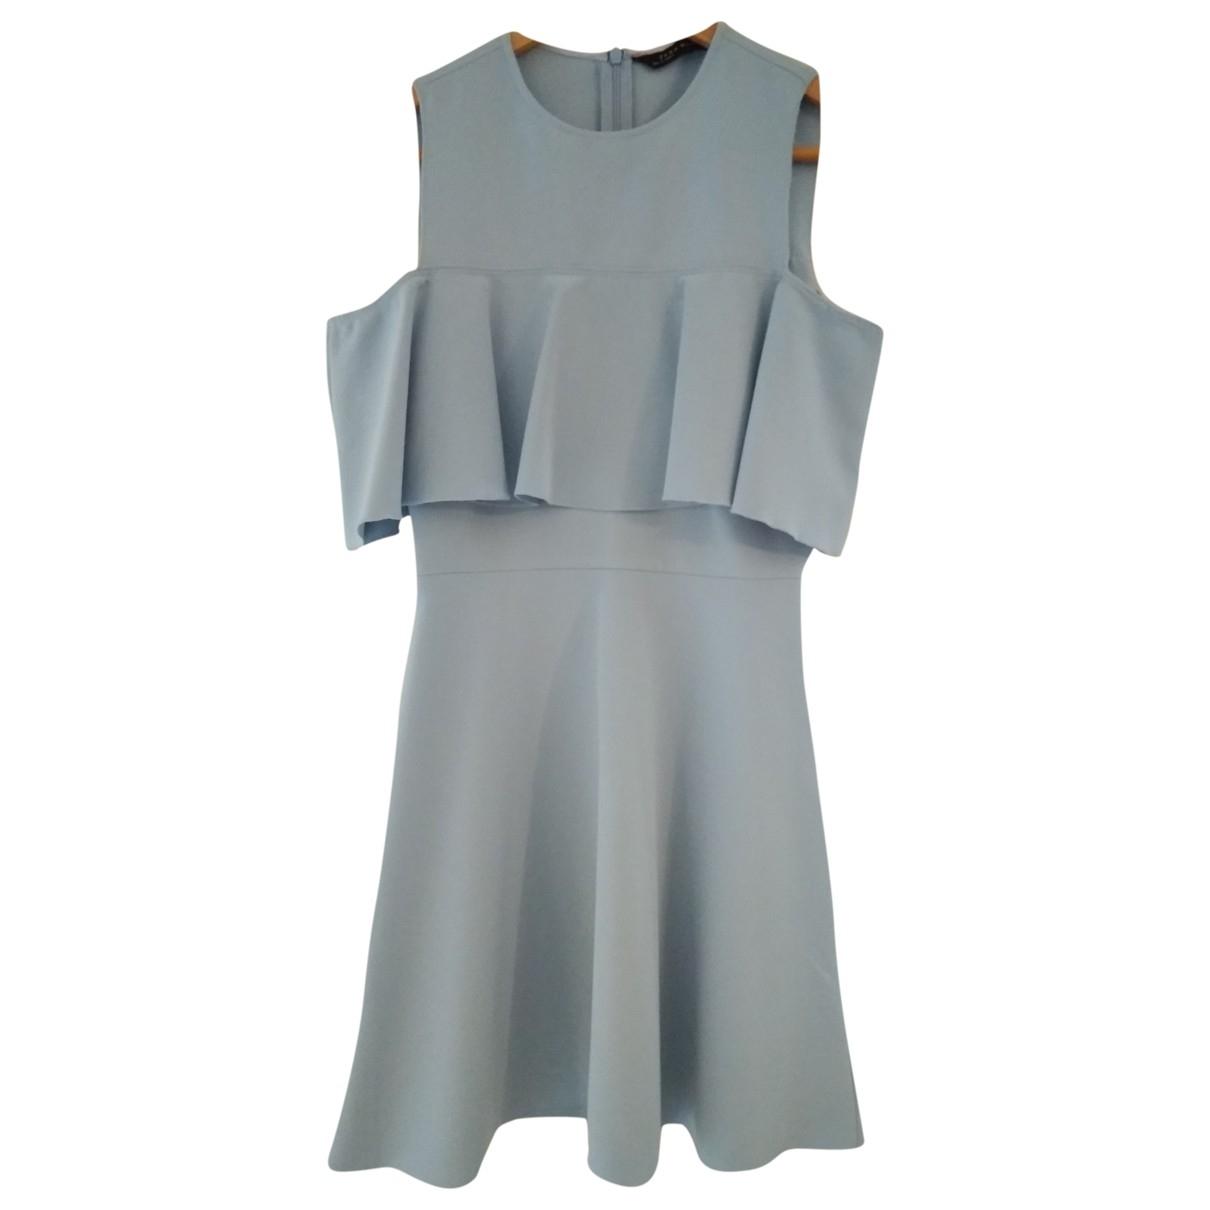 Zara \N Blue dress for Women XS International